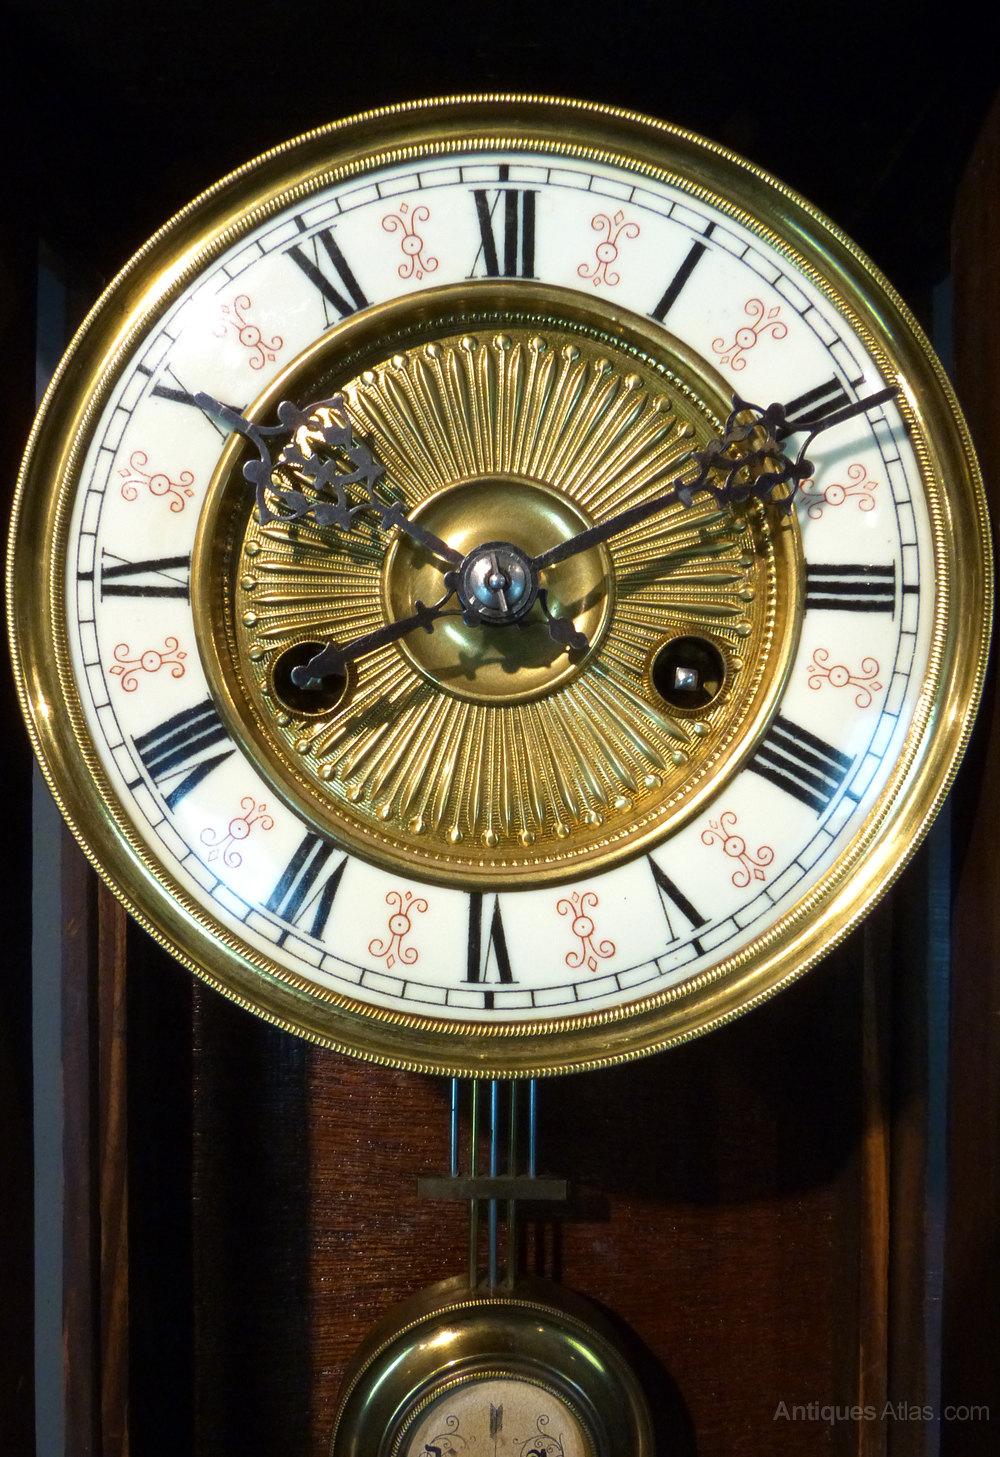 Antiques Atlas German Striking Wall Clock